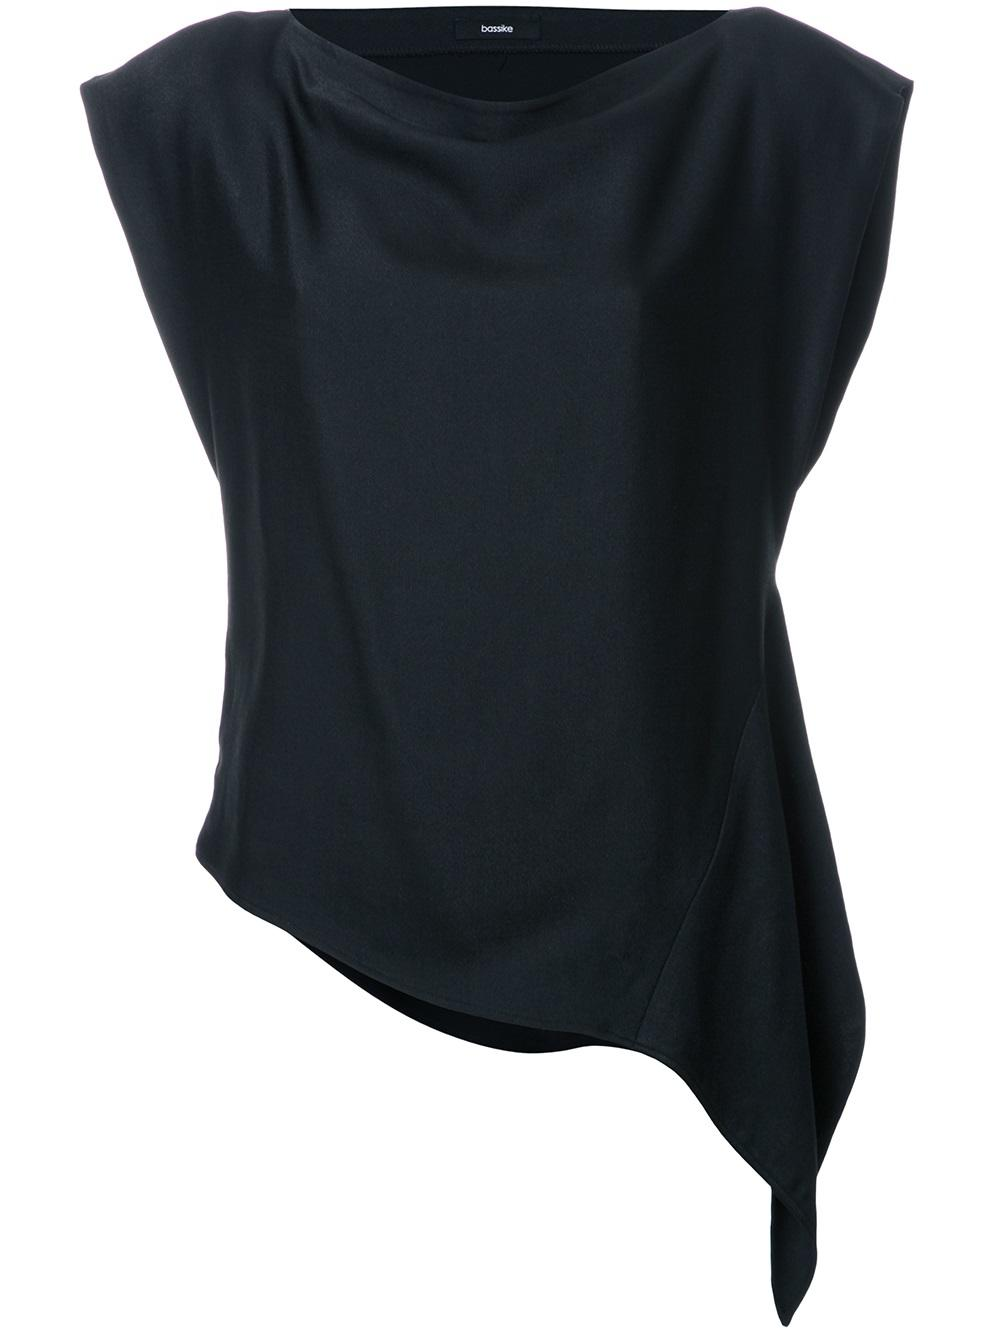 Bassike Crpe asymmetric blouse $465